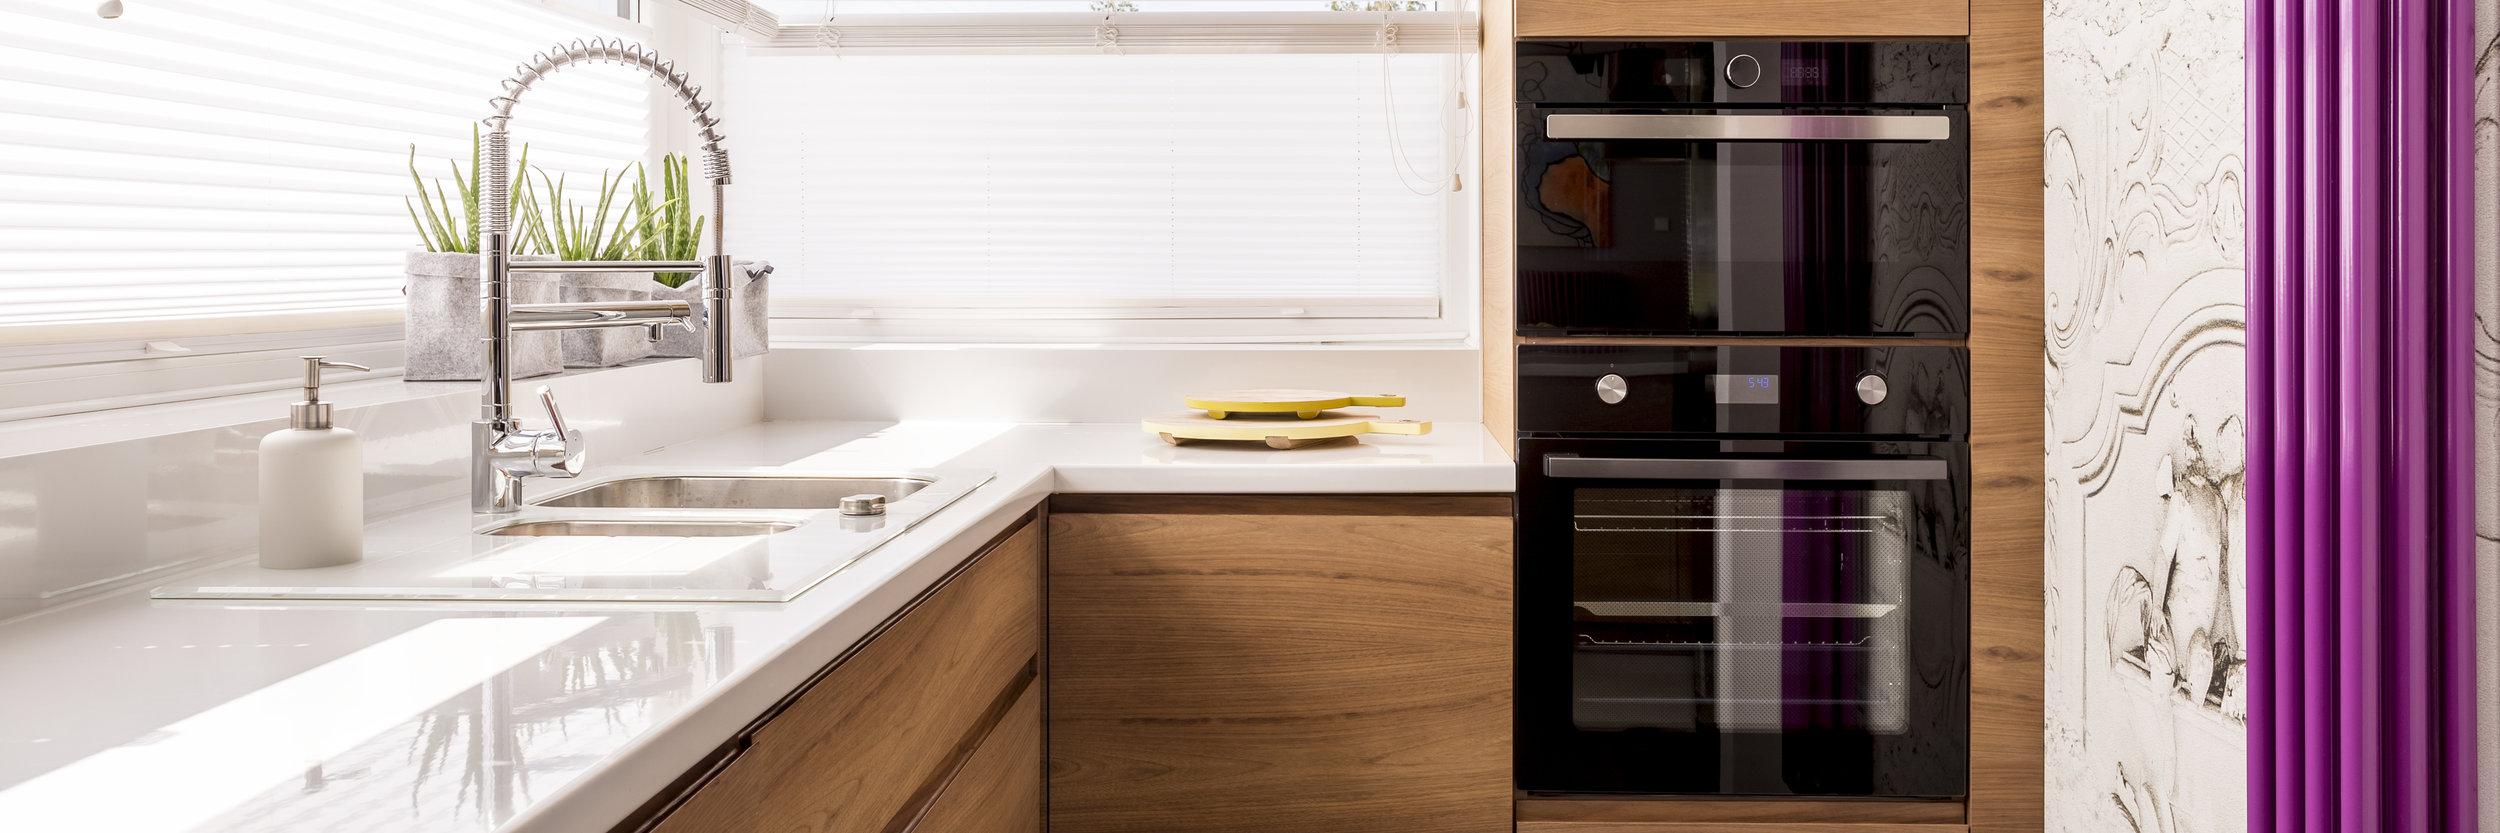 Kitchen with white glossy countertop.jpeg